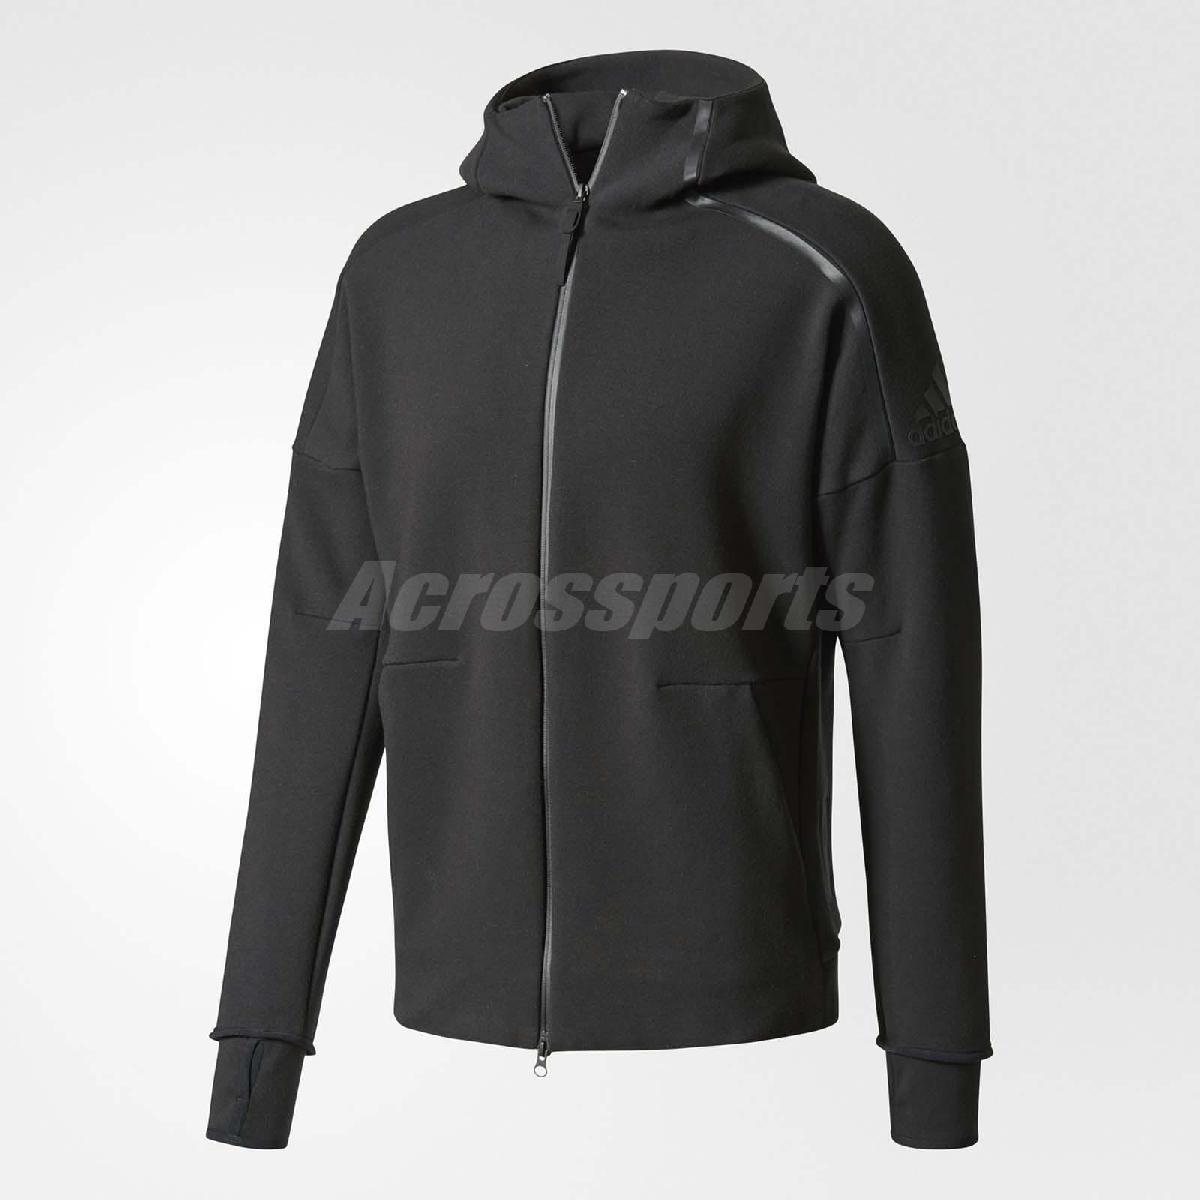 adidas連帽外套Z.N.E.HOODY 2長袖上衣帽踢連帽夾克運動經典基本款男款黑PUMP306 BQ6925